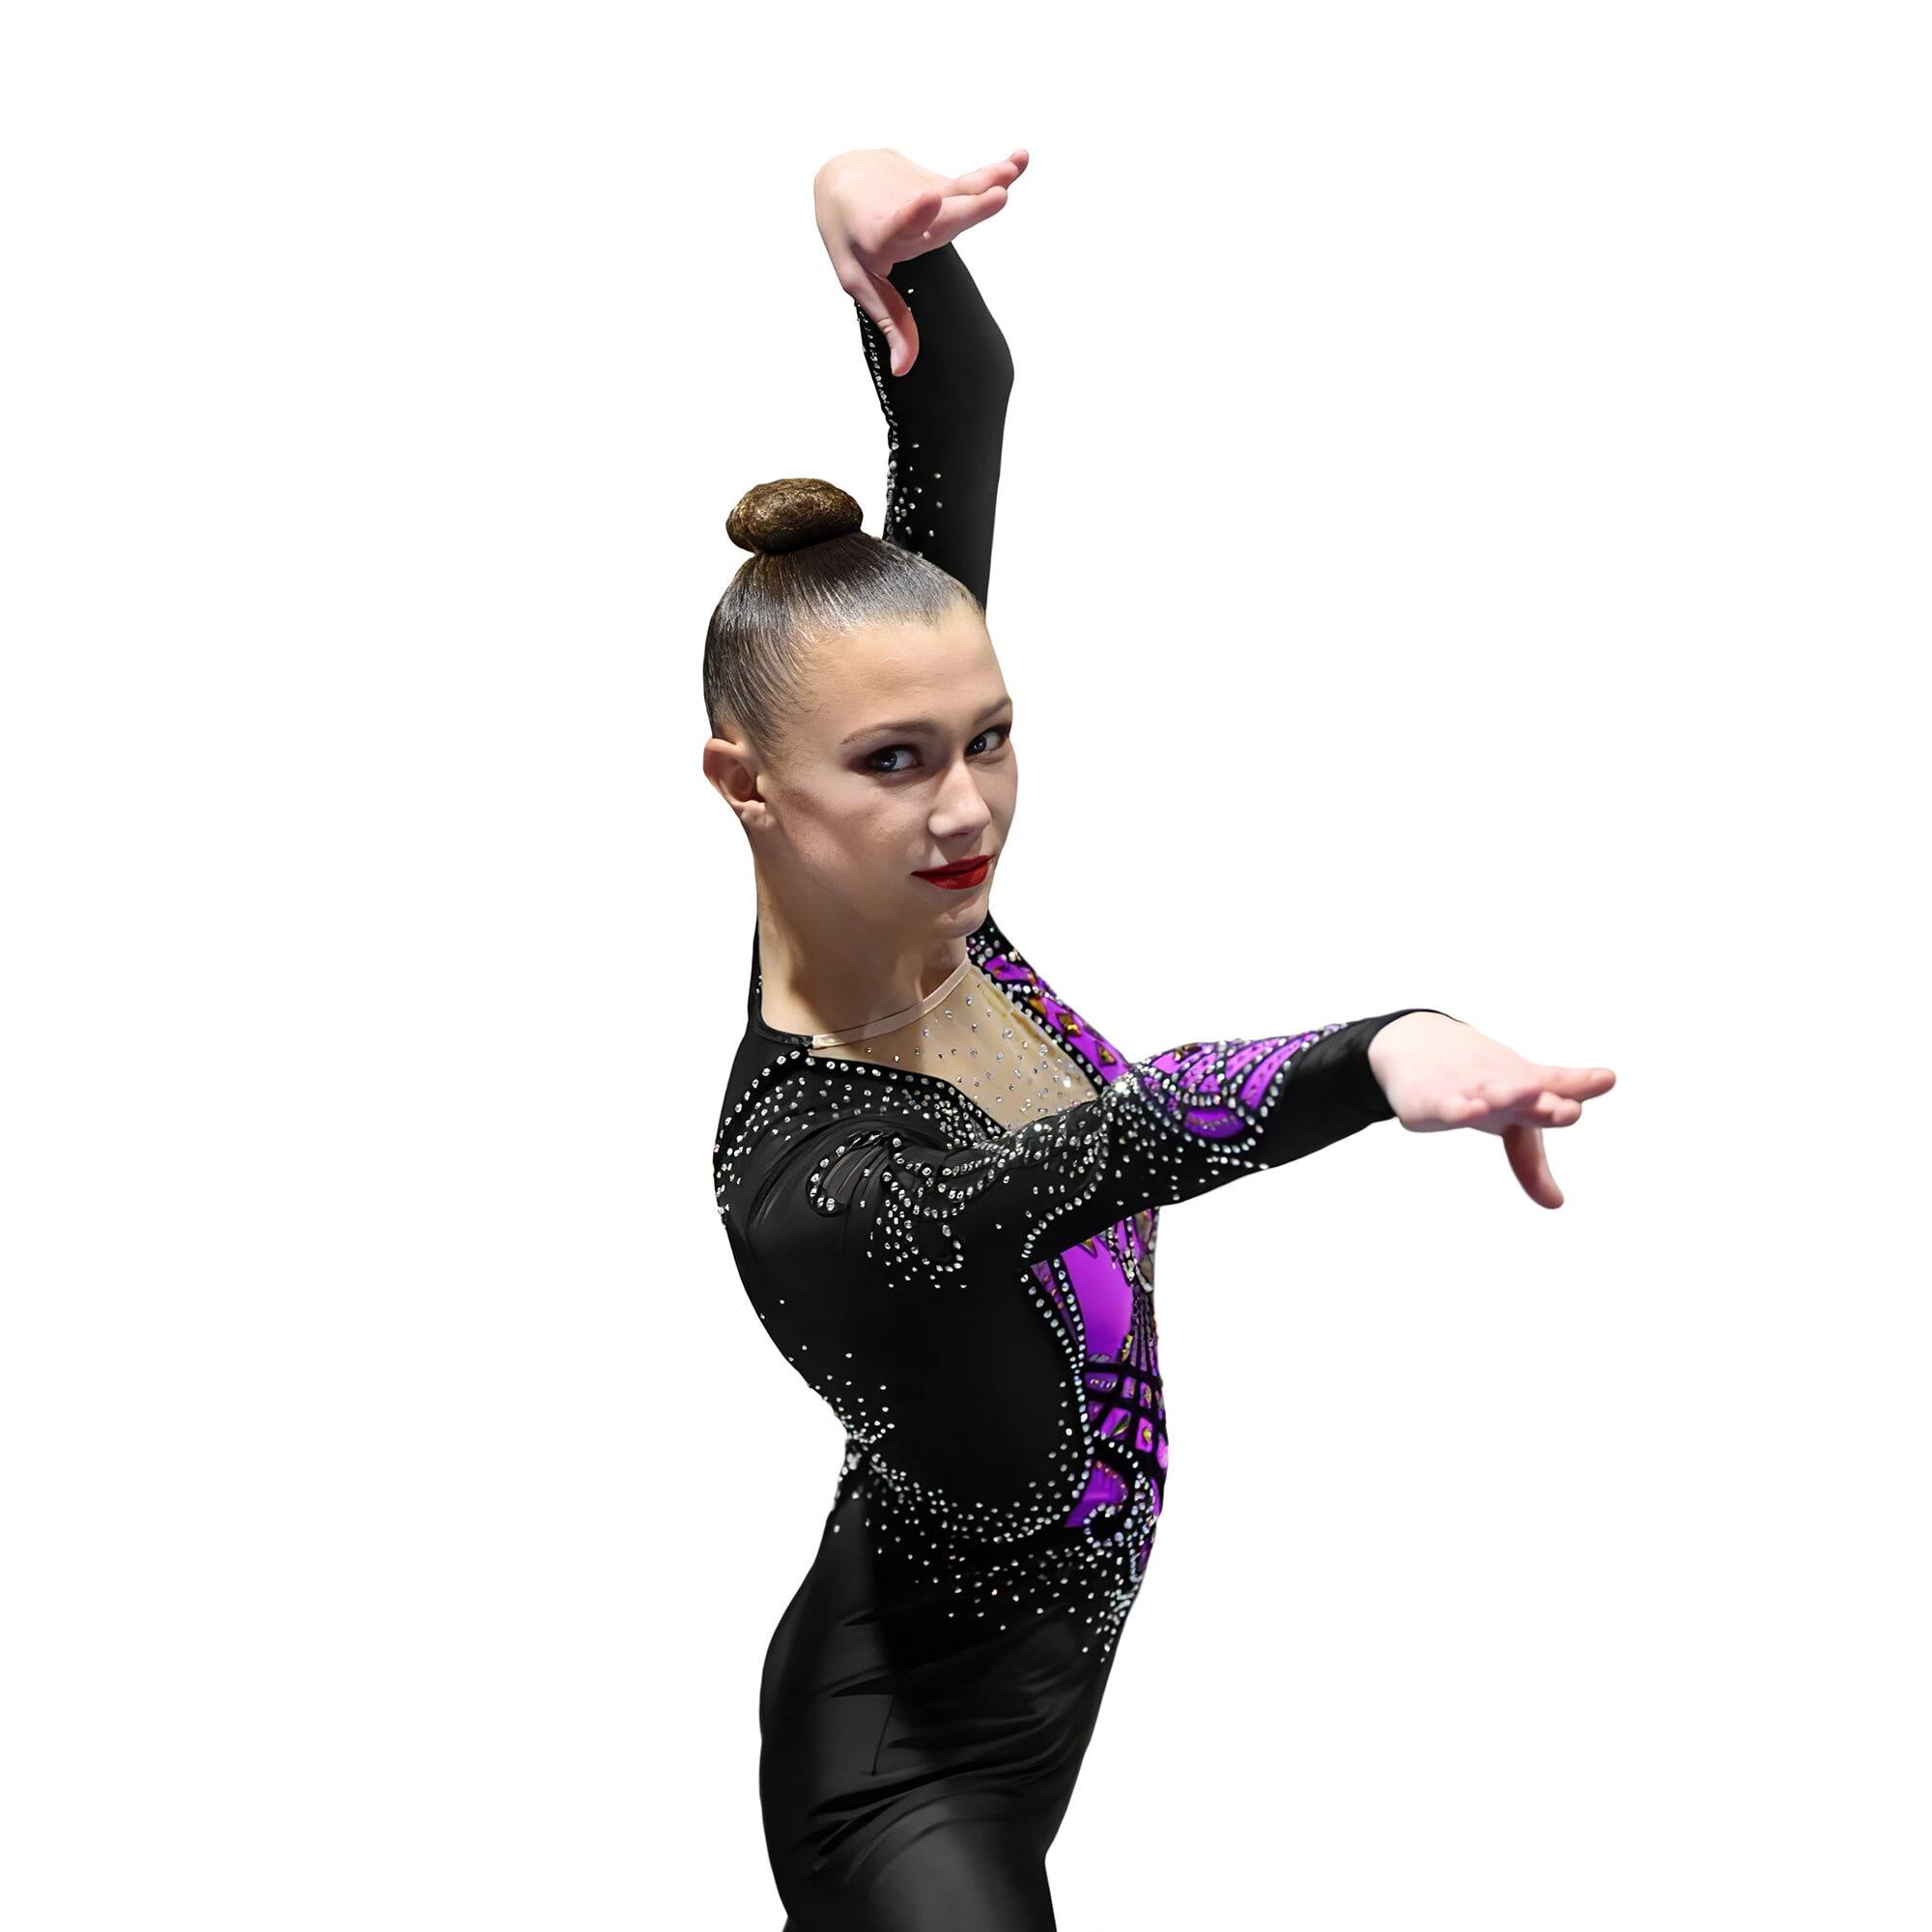 Acrobatic Gymnastics Competitive Jumpsuit № 234 made in black & violet